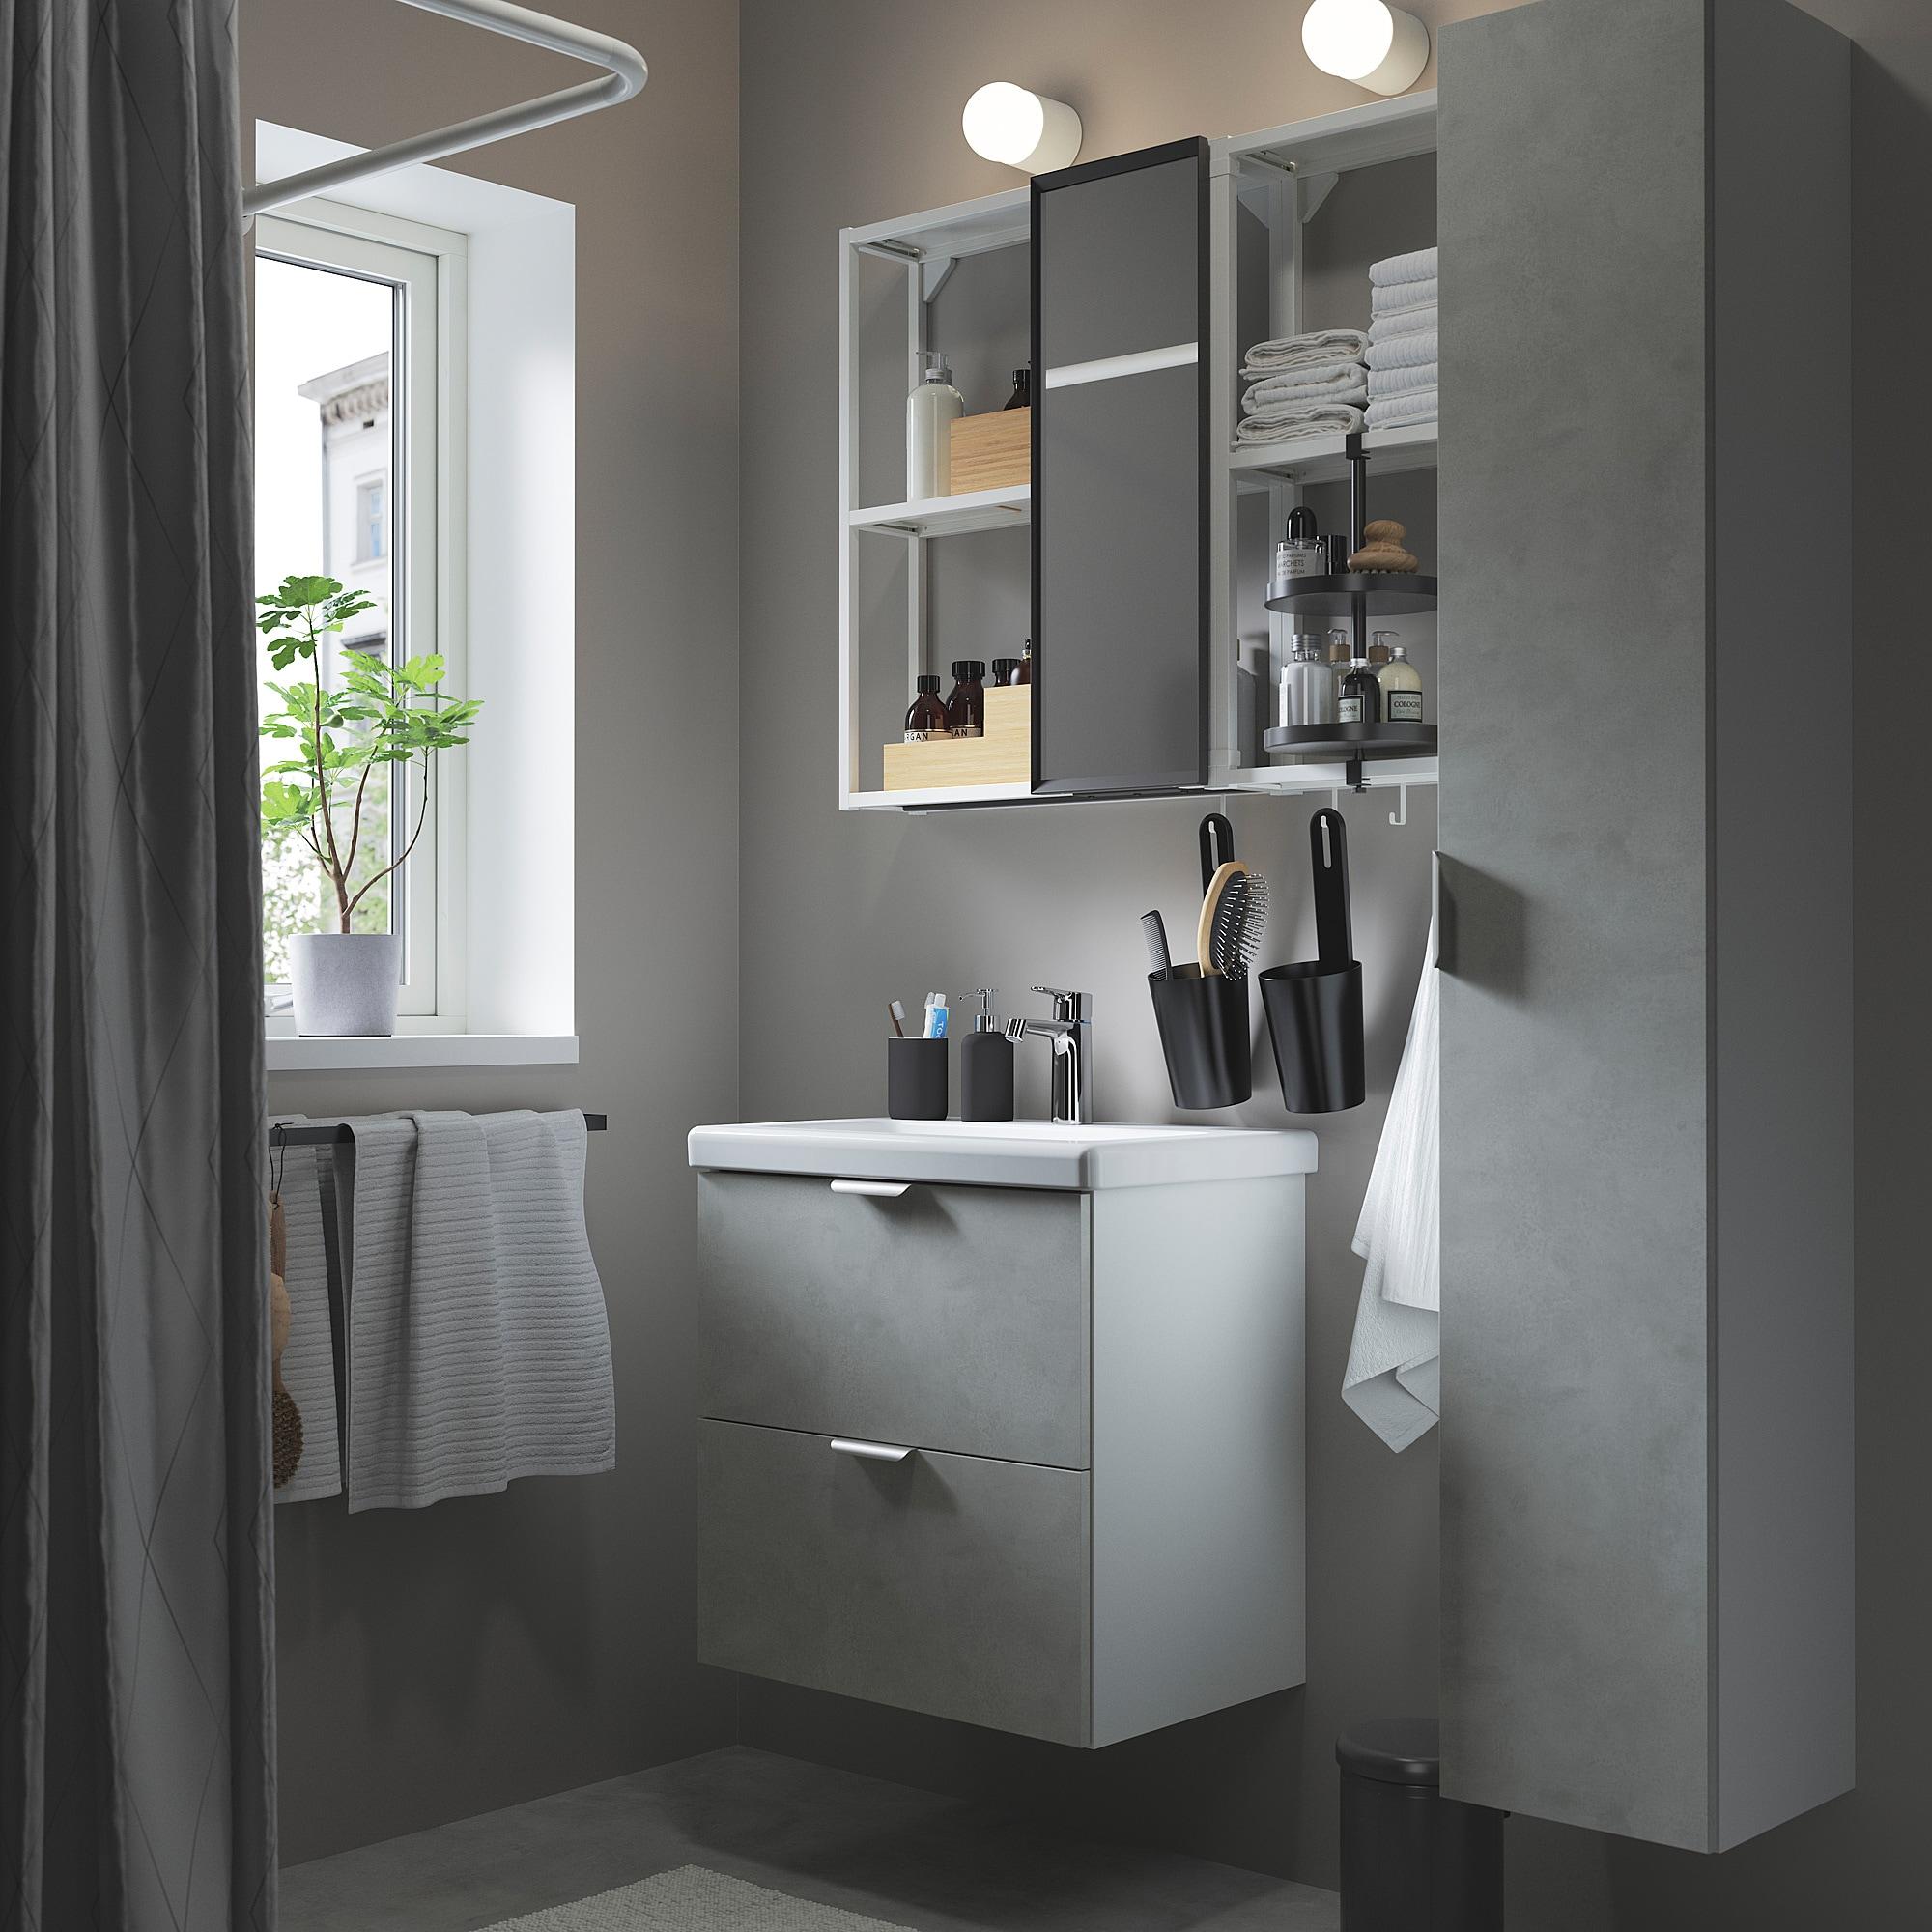 ENHET / TVÄLLEN Bathroom furniture, set of 18, concrete effect/white Brogrund tap, 64x43x65 cm